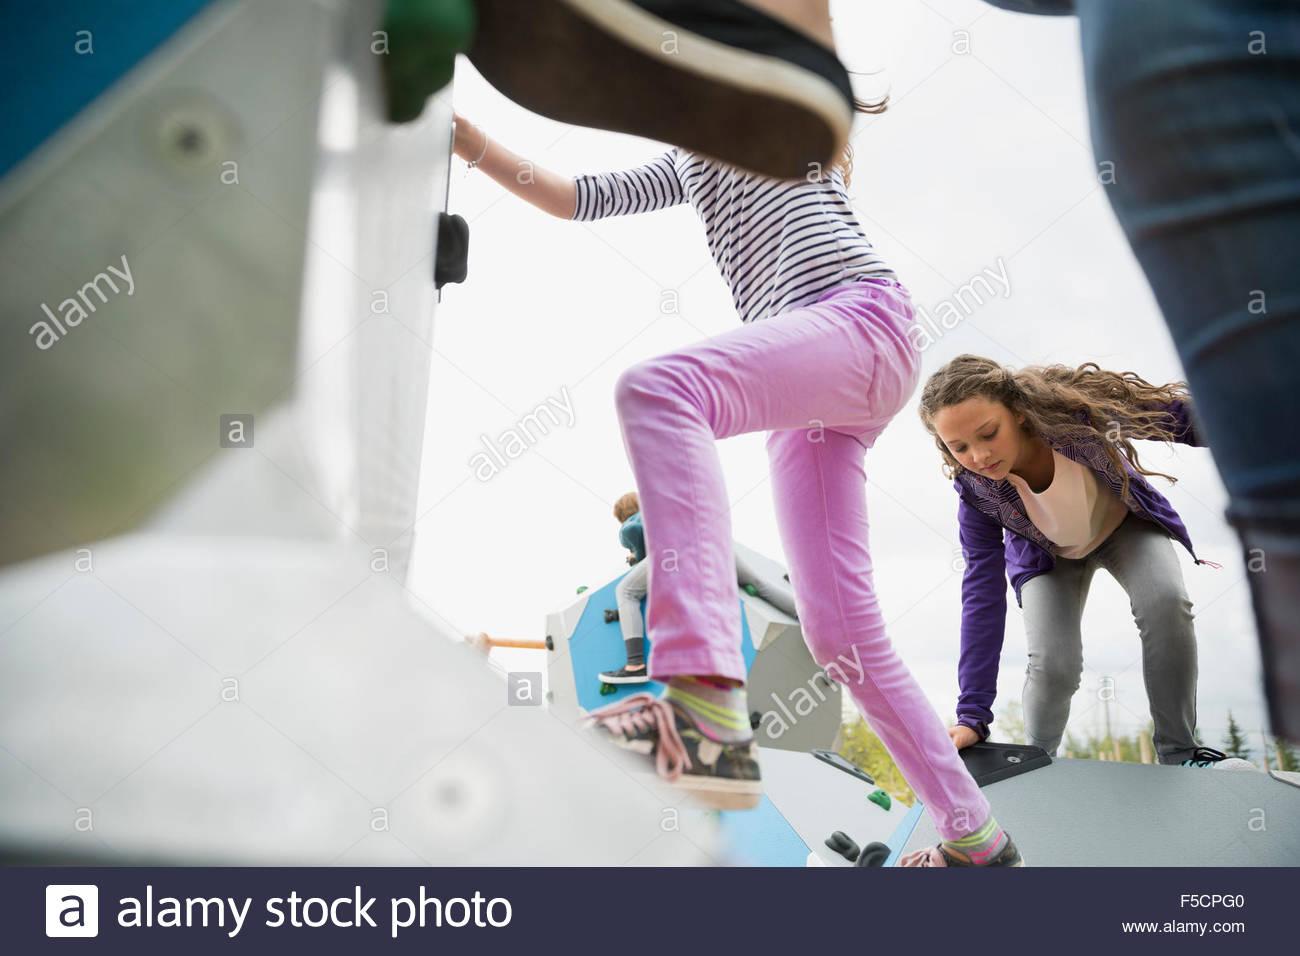 Kids climbing geometric shapes at playground - Stock Image